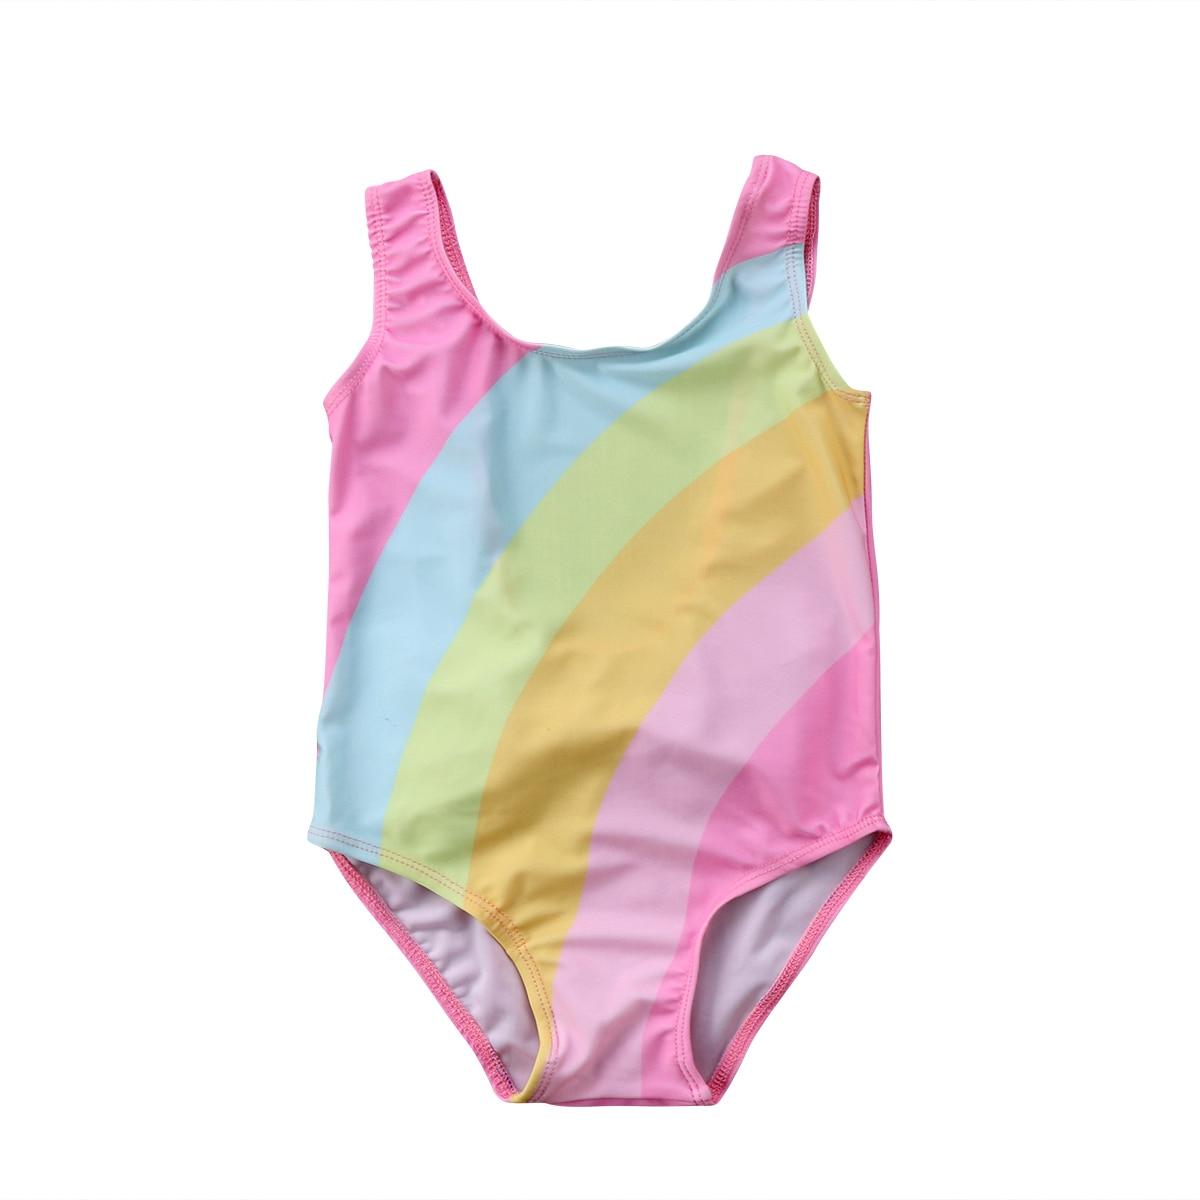 Glane Princess Girls Bow Rainbow Swimsuit One Pieces